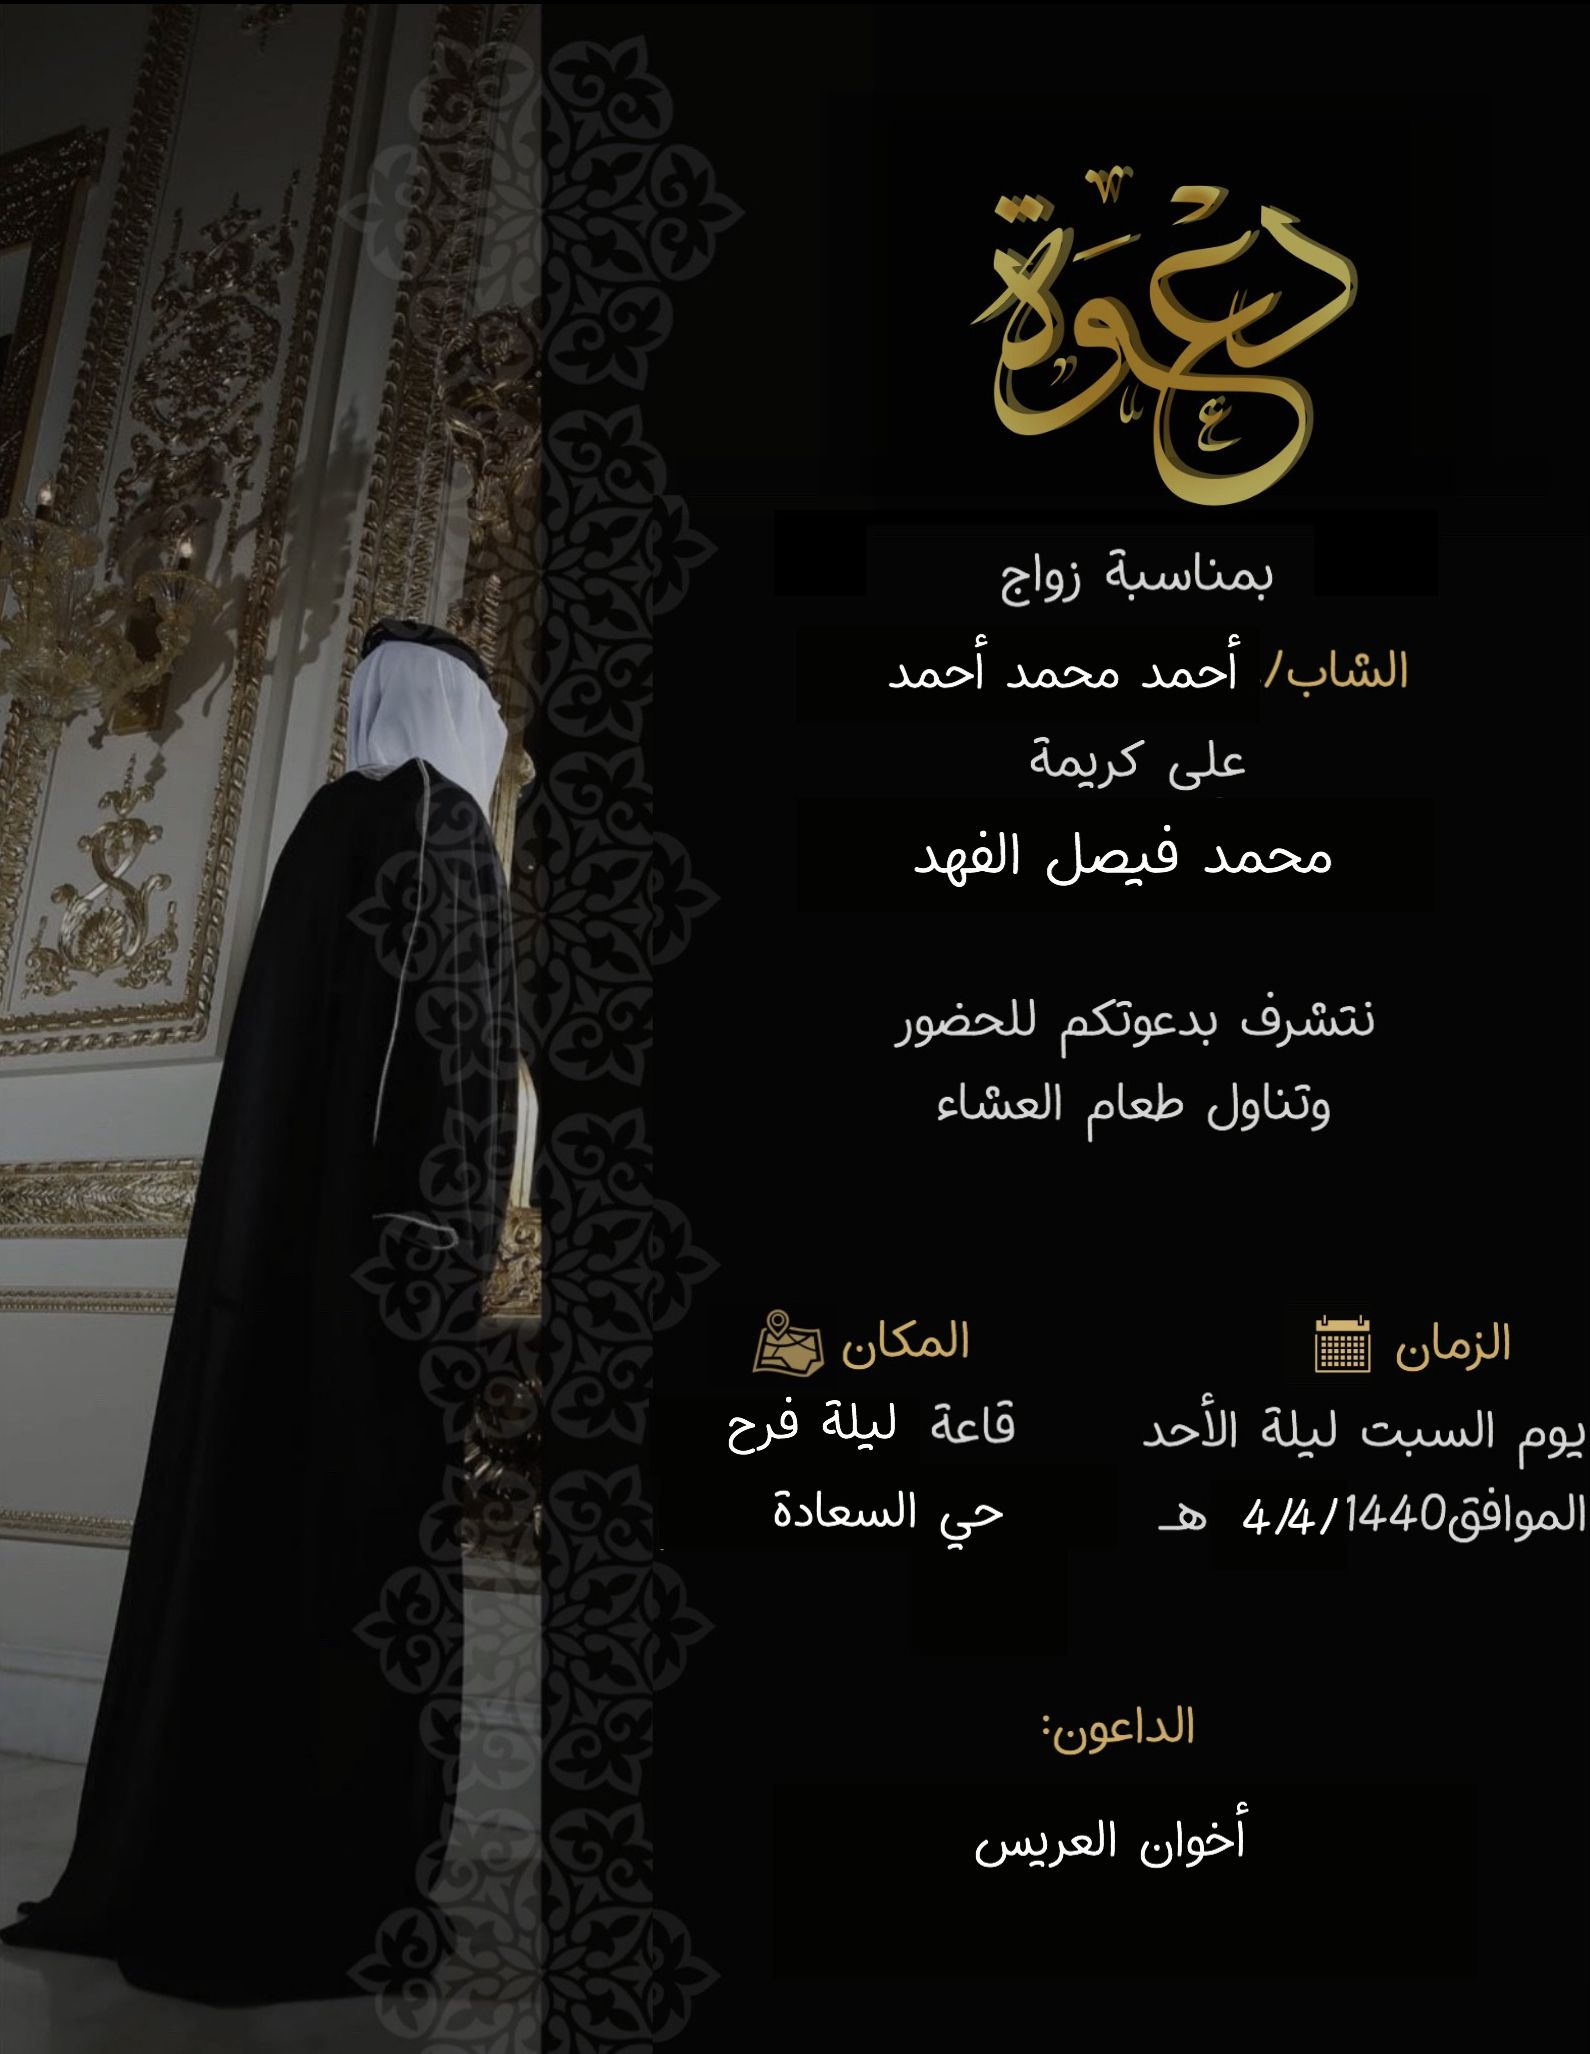 دعوة زفاف In 2021 Digital Wedding Invitations Design Photo Collage Template Phone Wallpaper Patterns